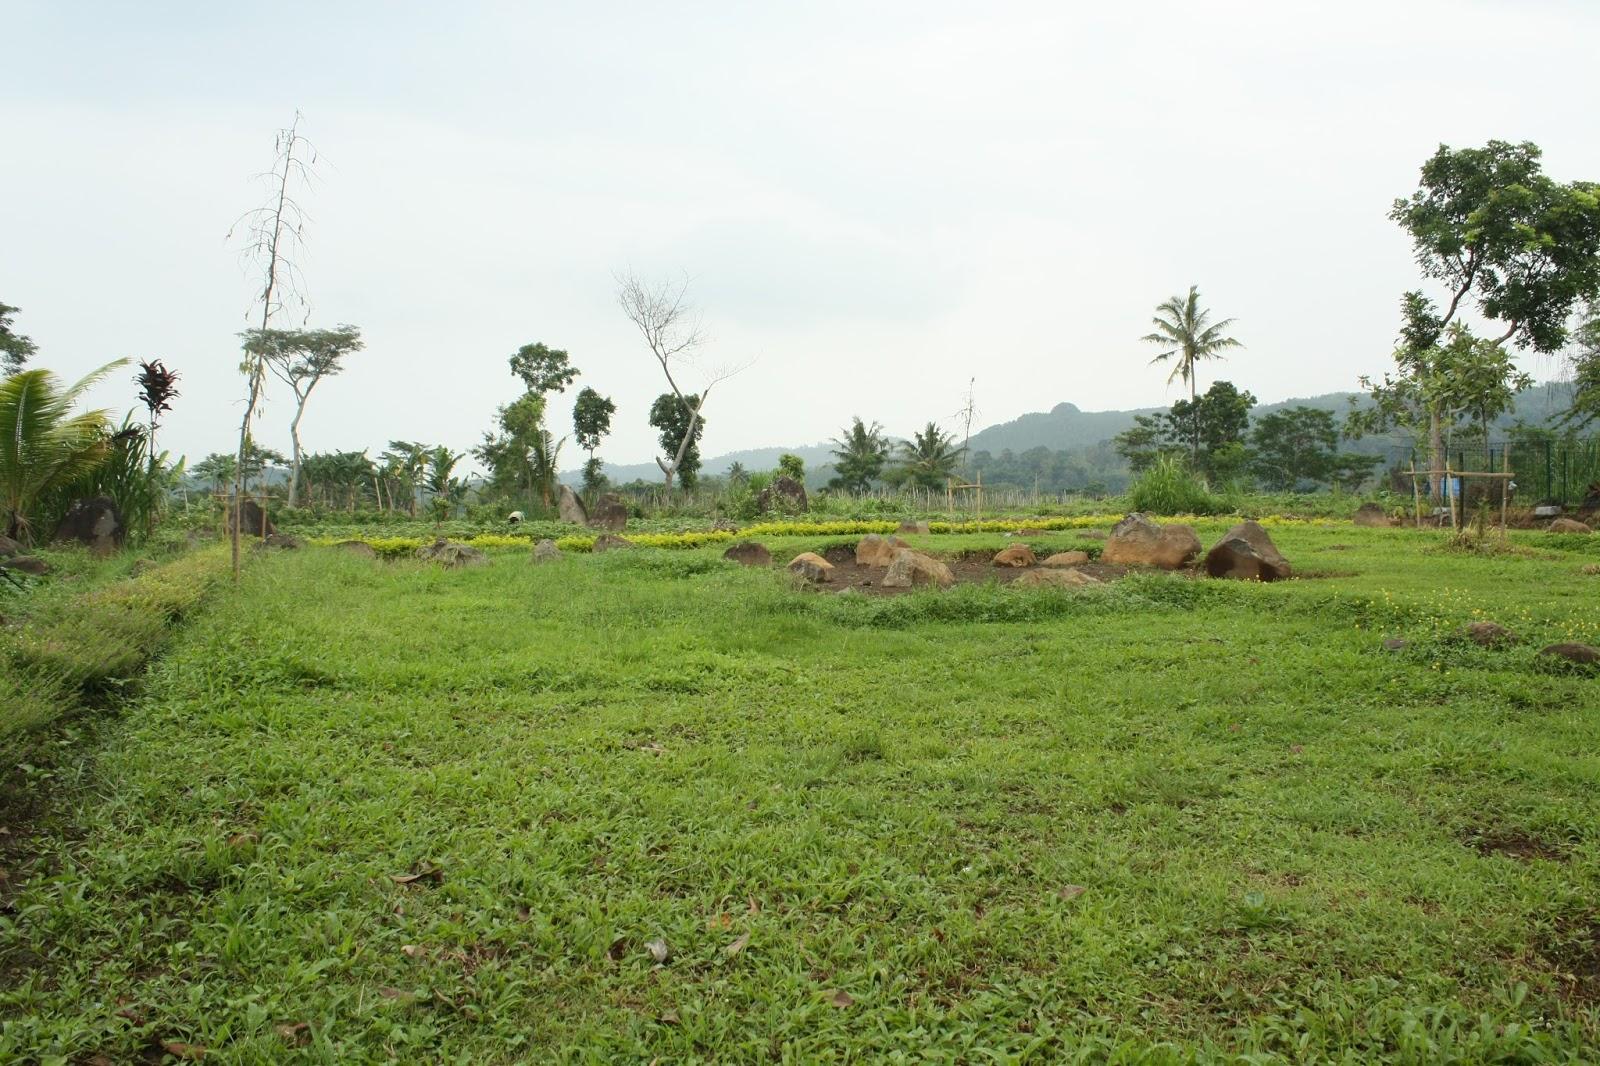 Situs Watu Kandang Matesih Karang Anyar Noto Budiyanto Berbentuk Batu